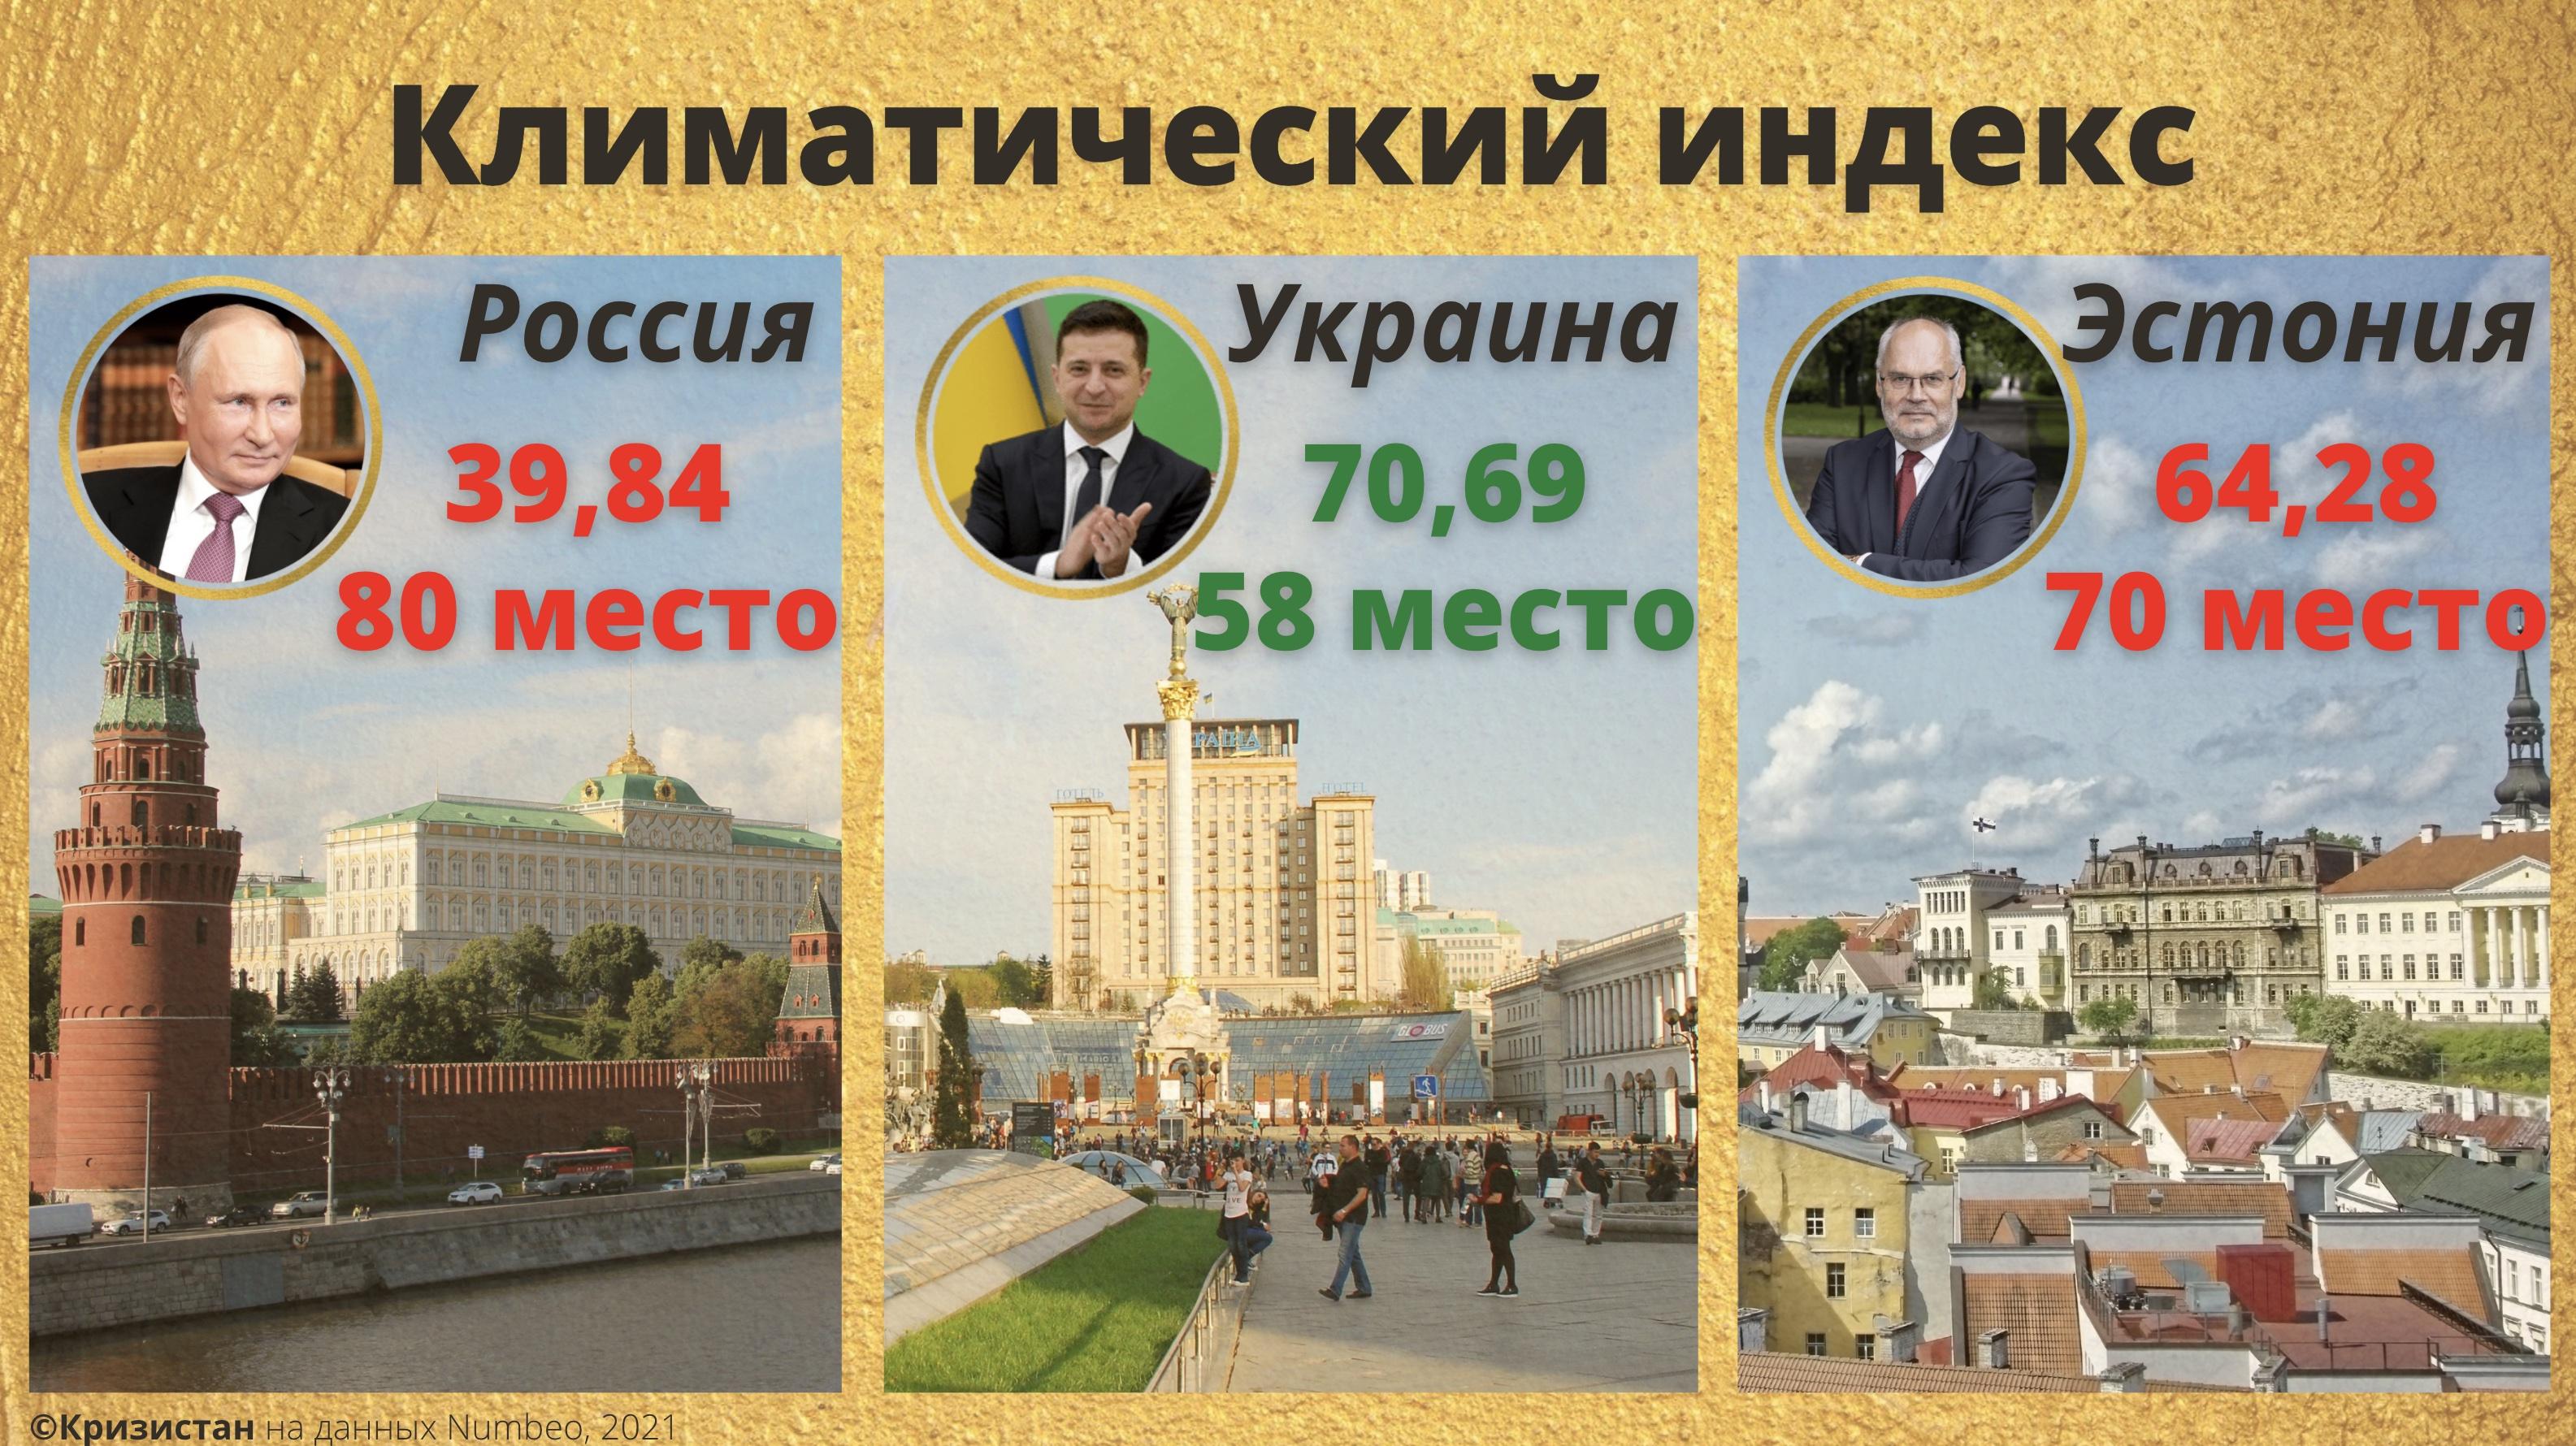 Климатический индекс - Украина, РФ, Эстония